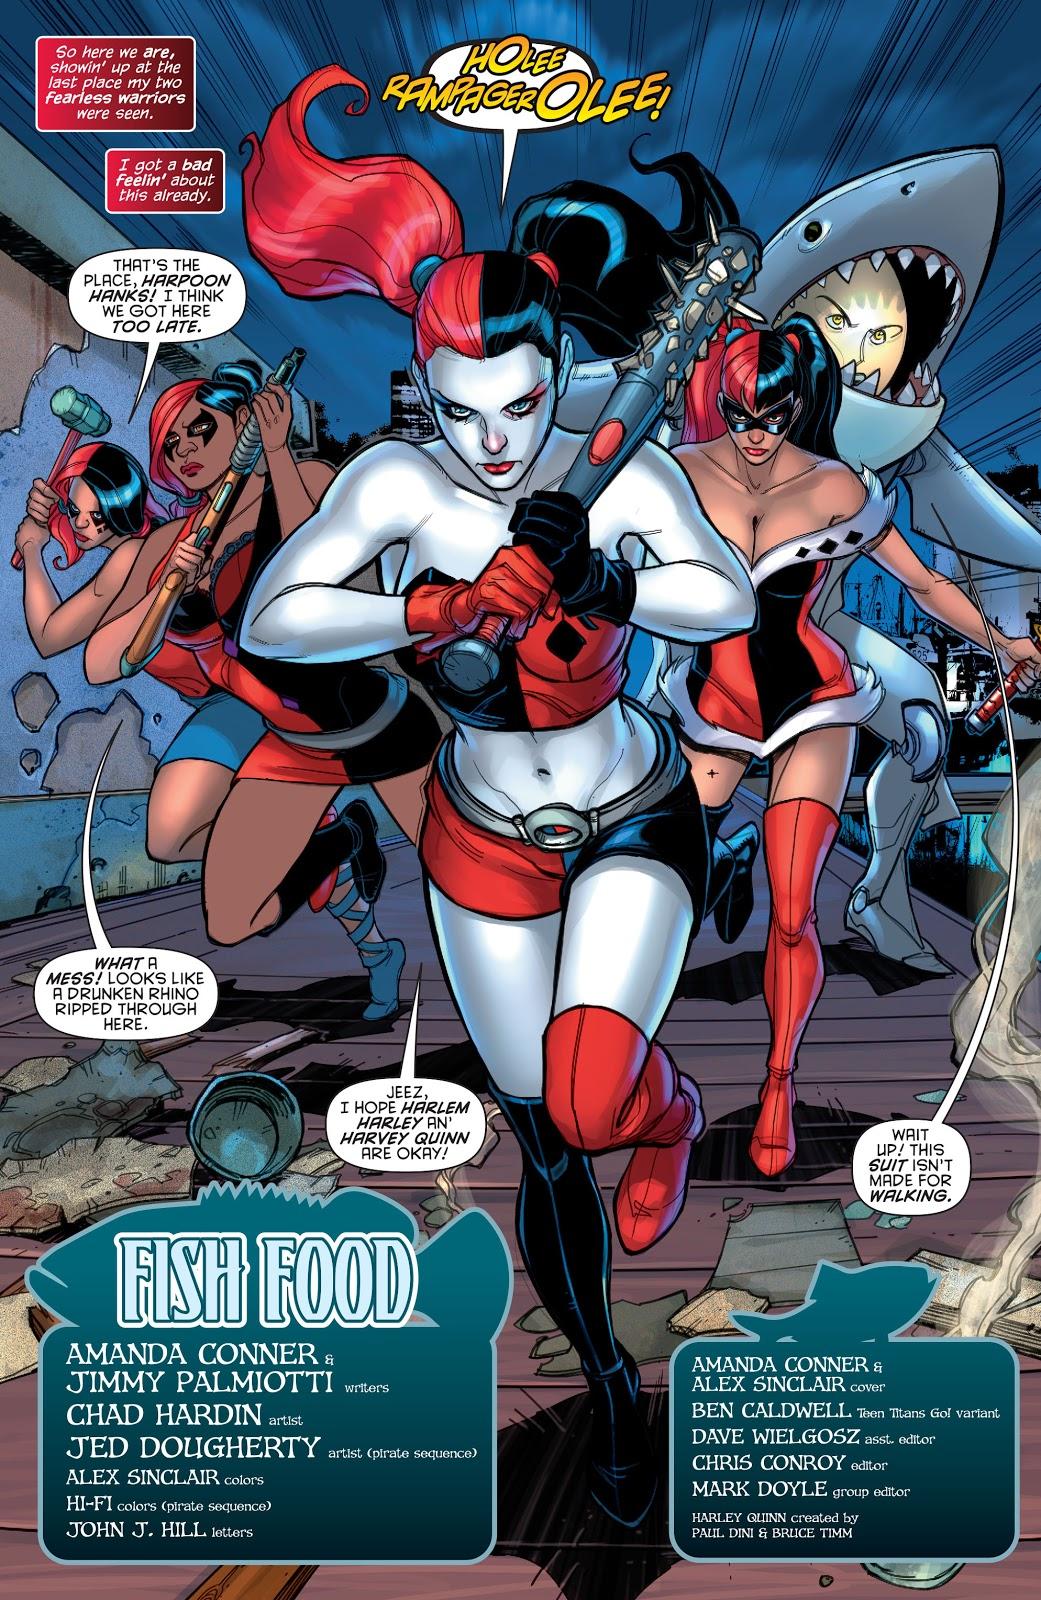 Harley Quinn Vol. 2 #18